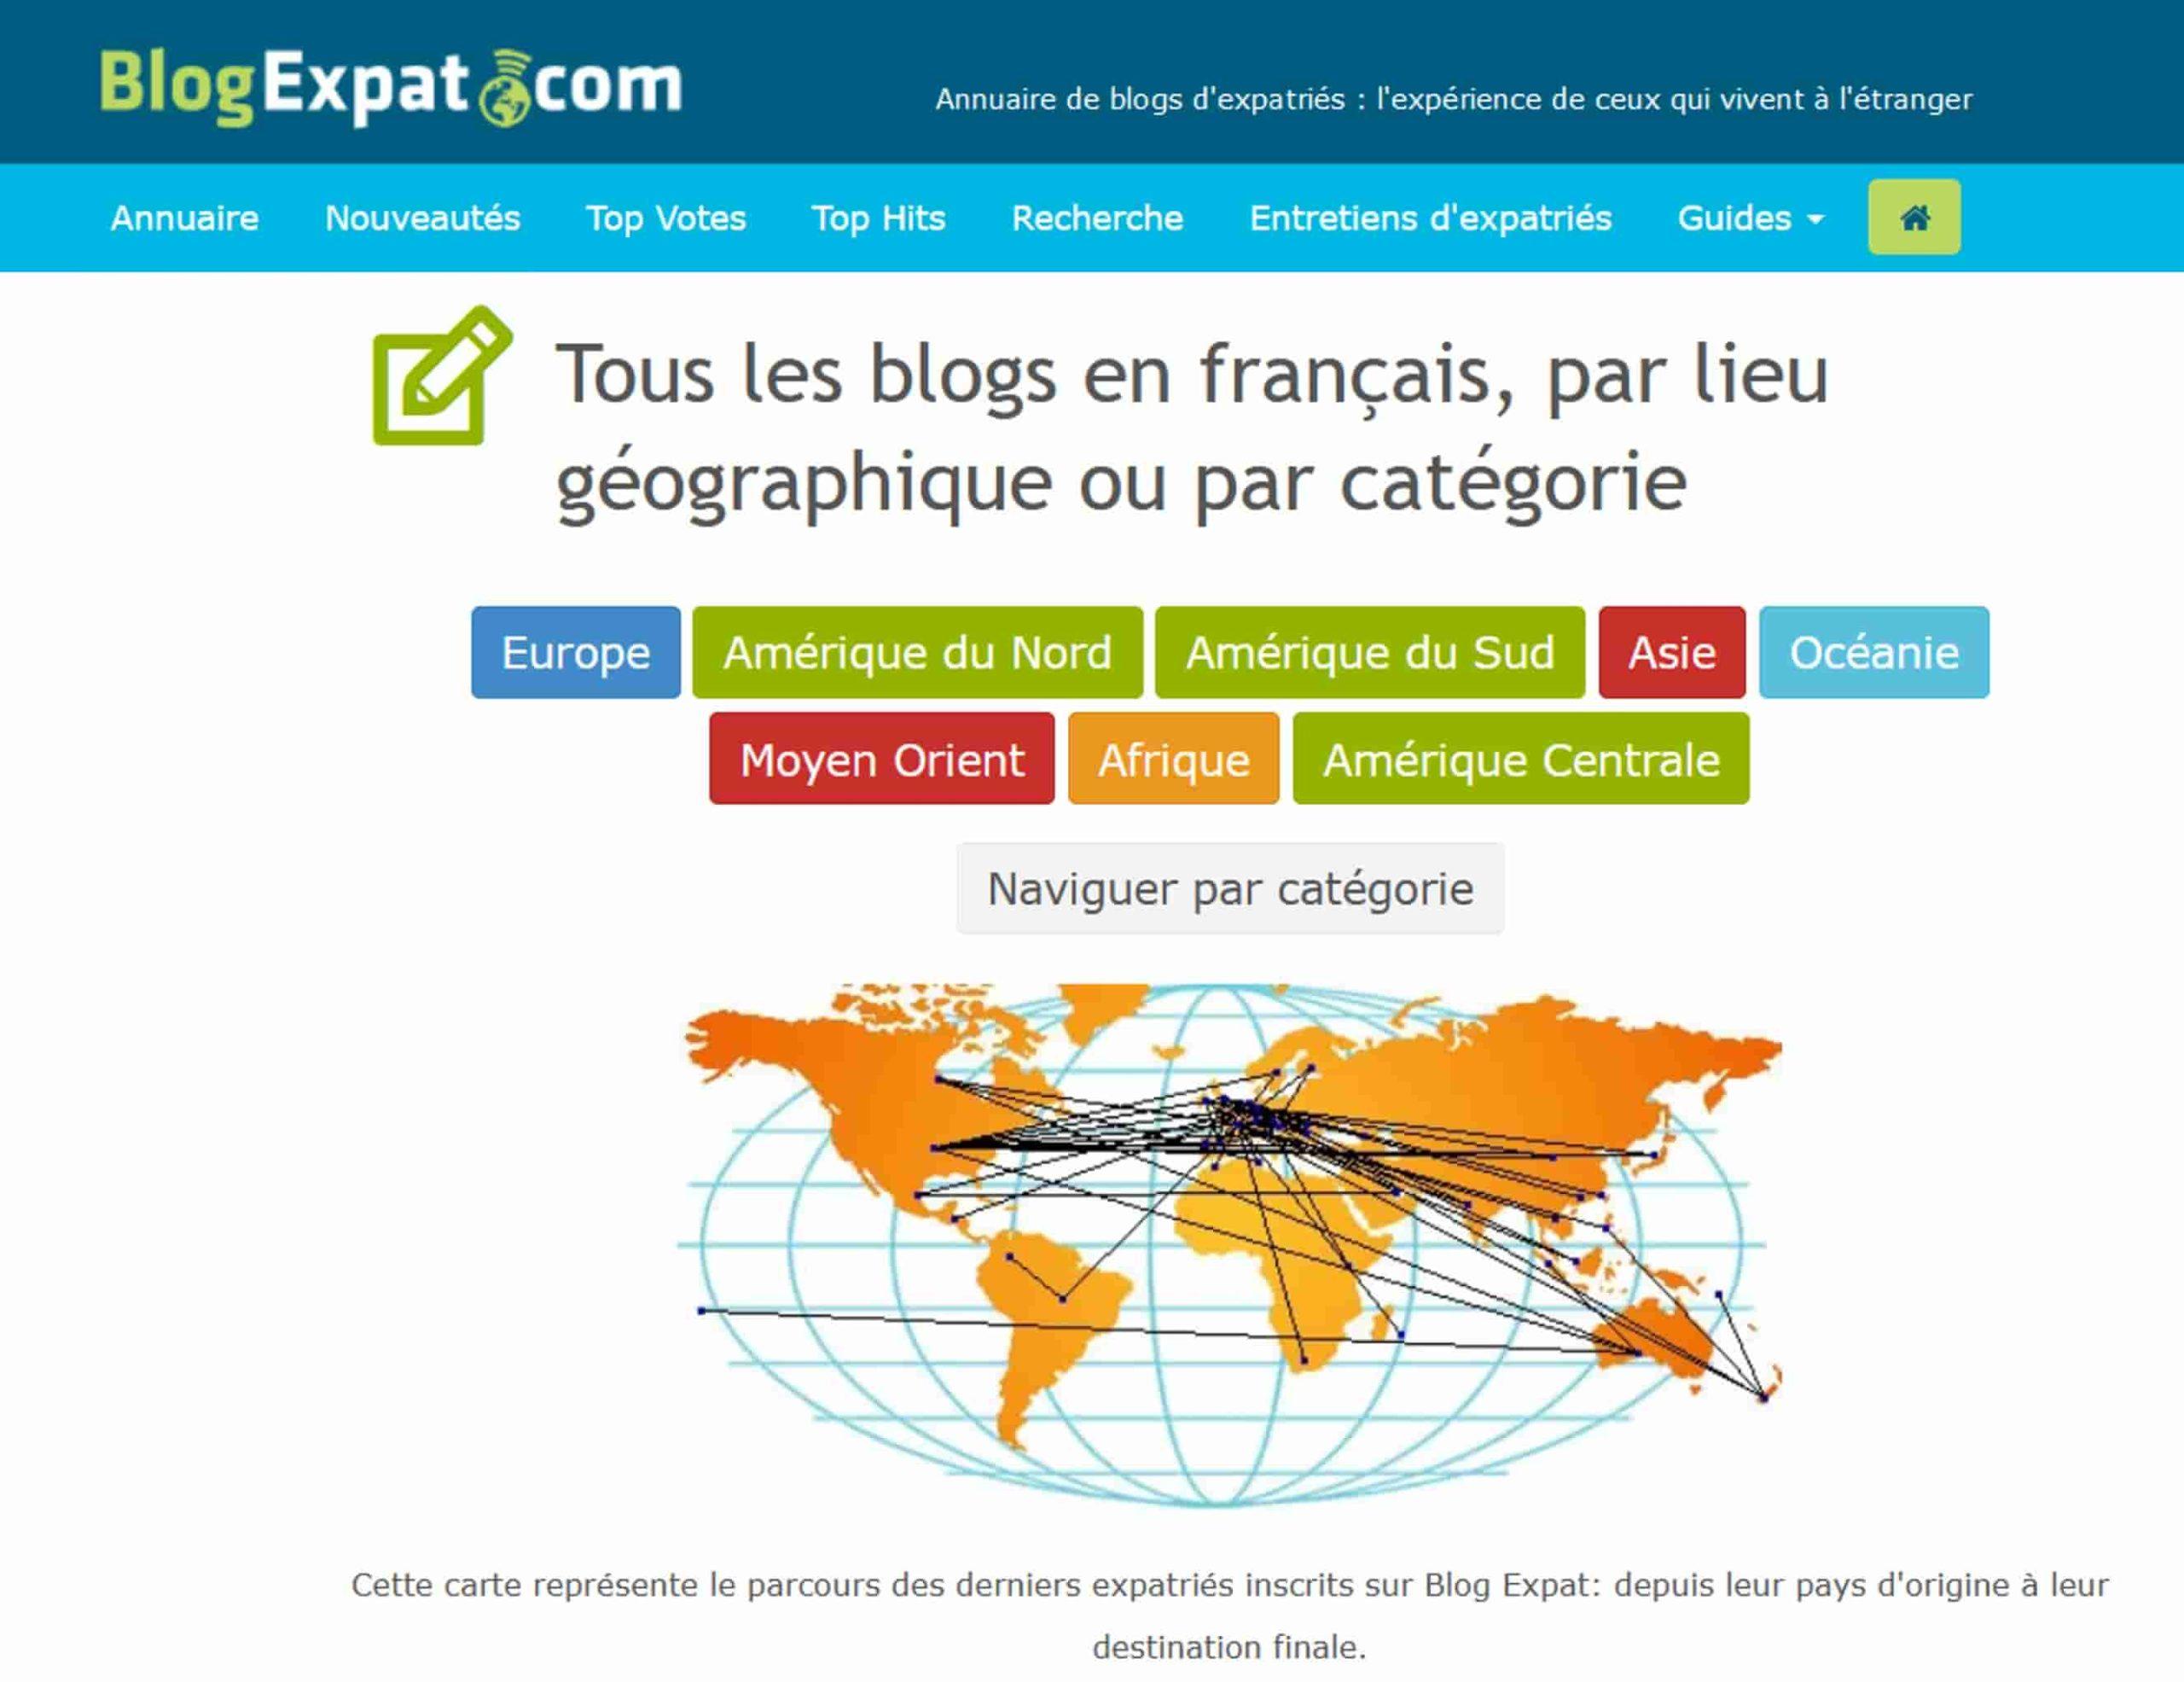 Aperçu du site BlogExpat.com qui rassemblent les blogs d'expat francophones